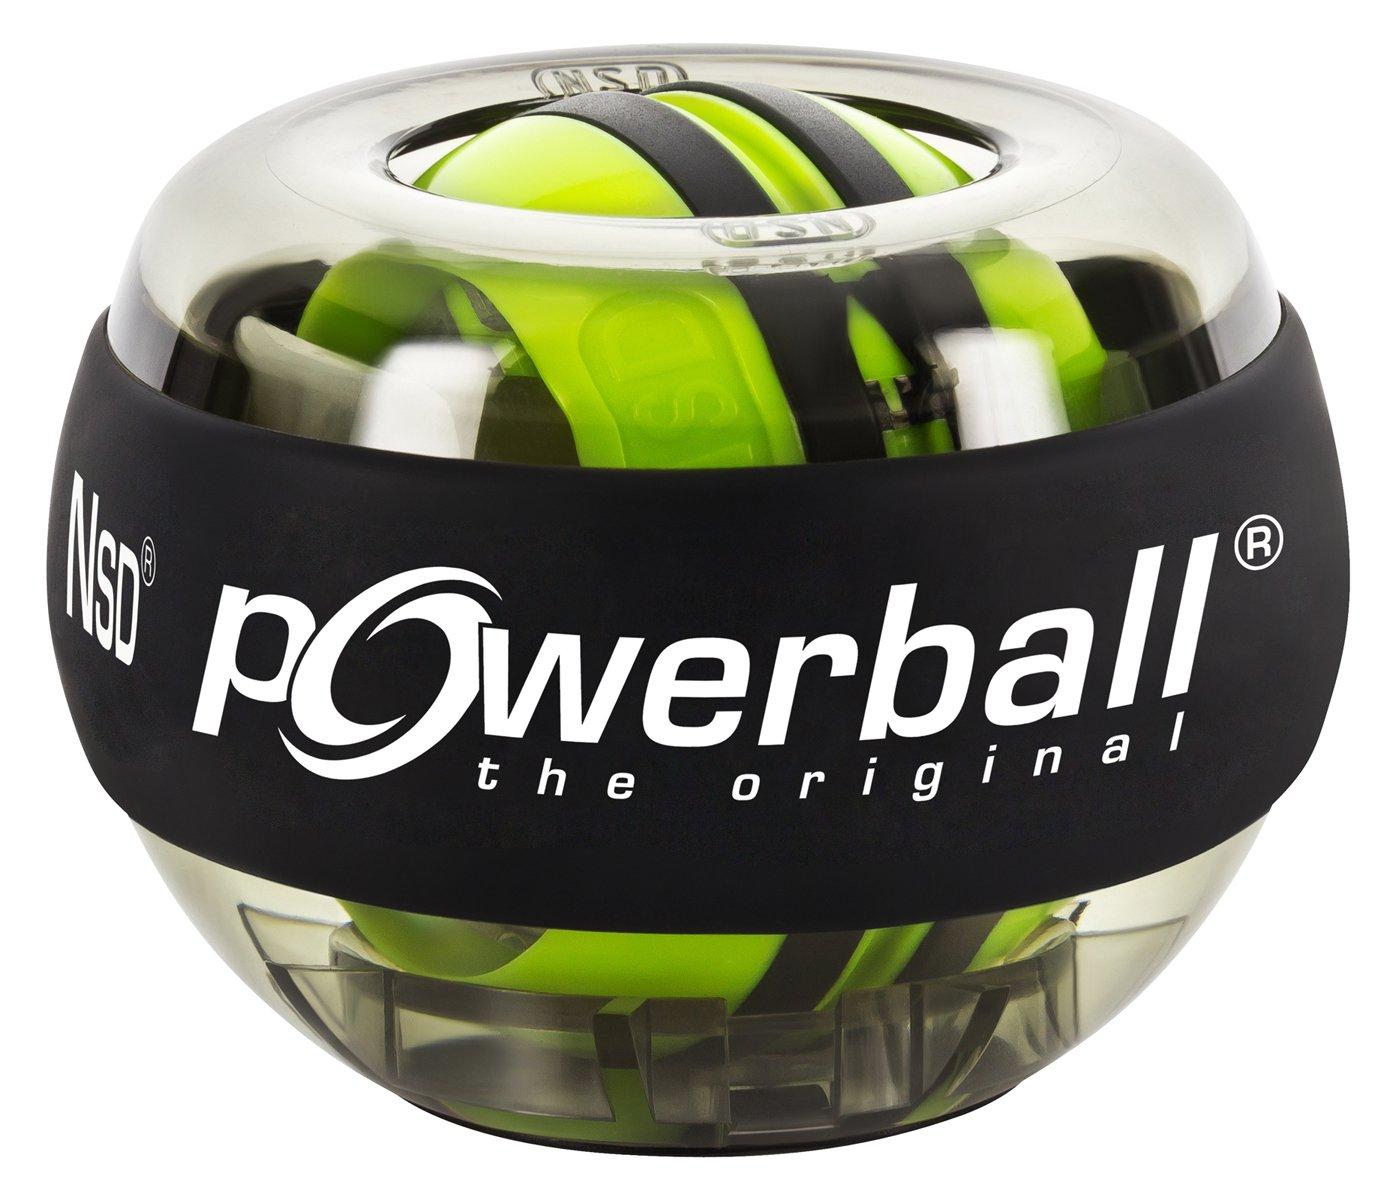 Powerball the original® Handtrainer Autostart Powerball, Unisex, Negro Transparente product image